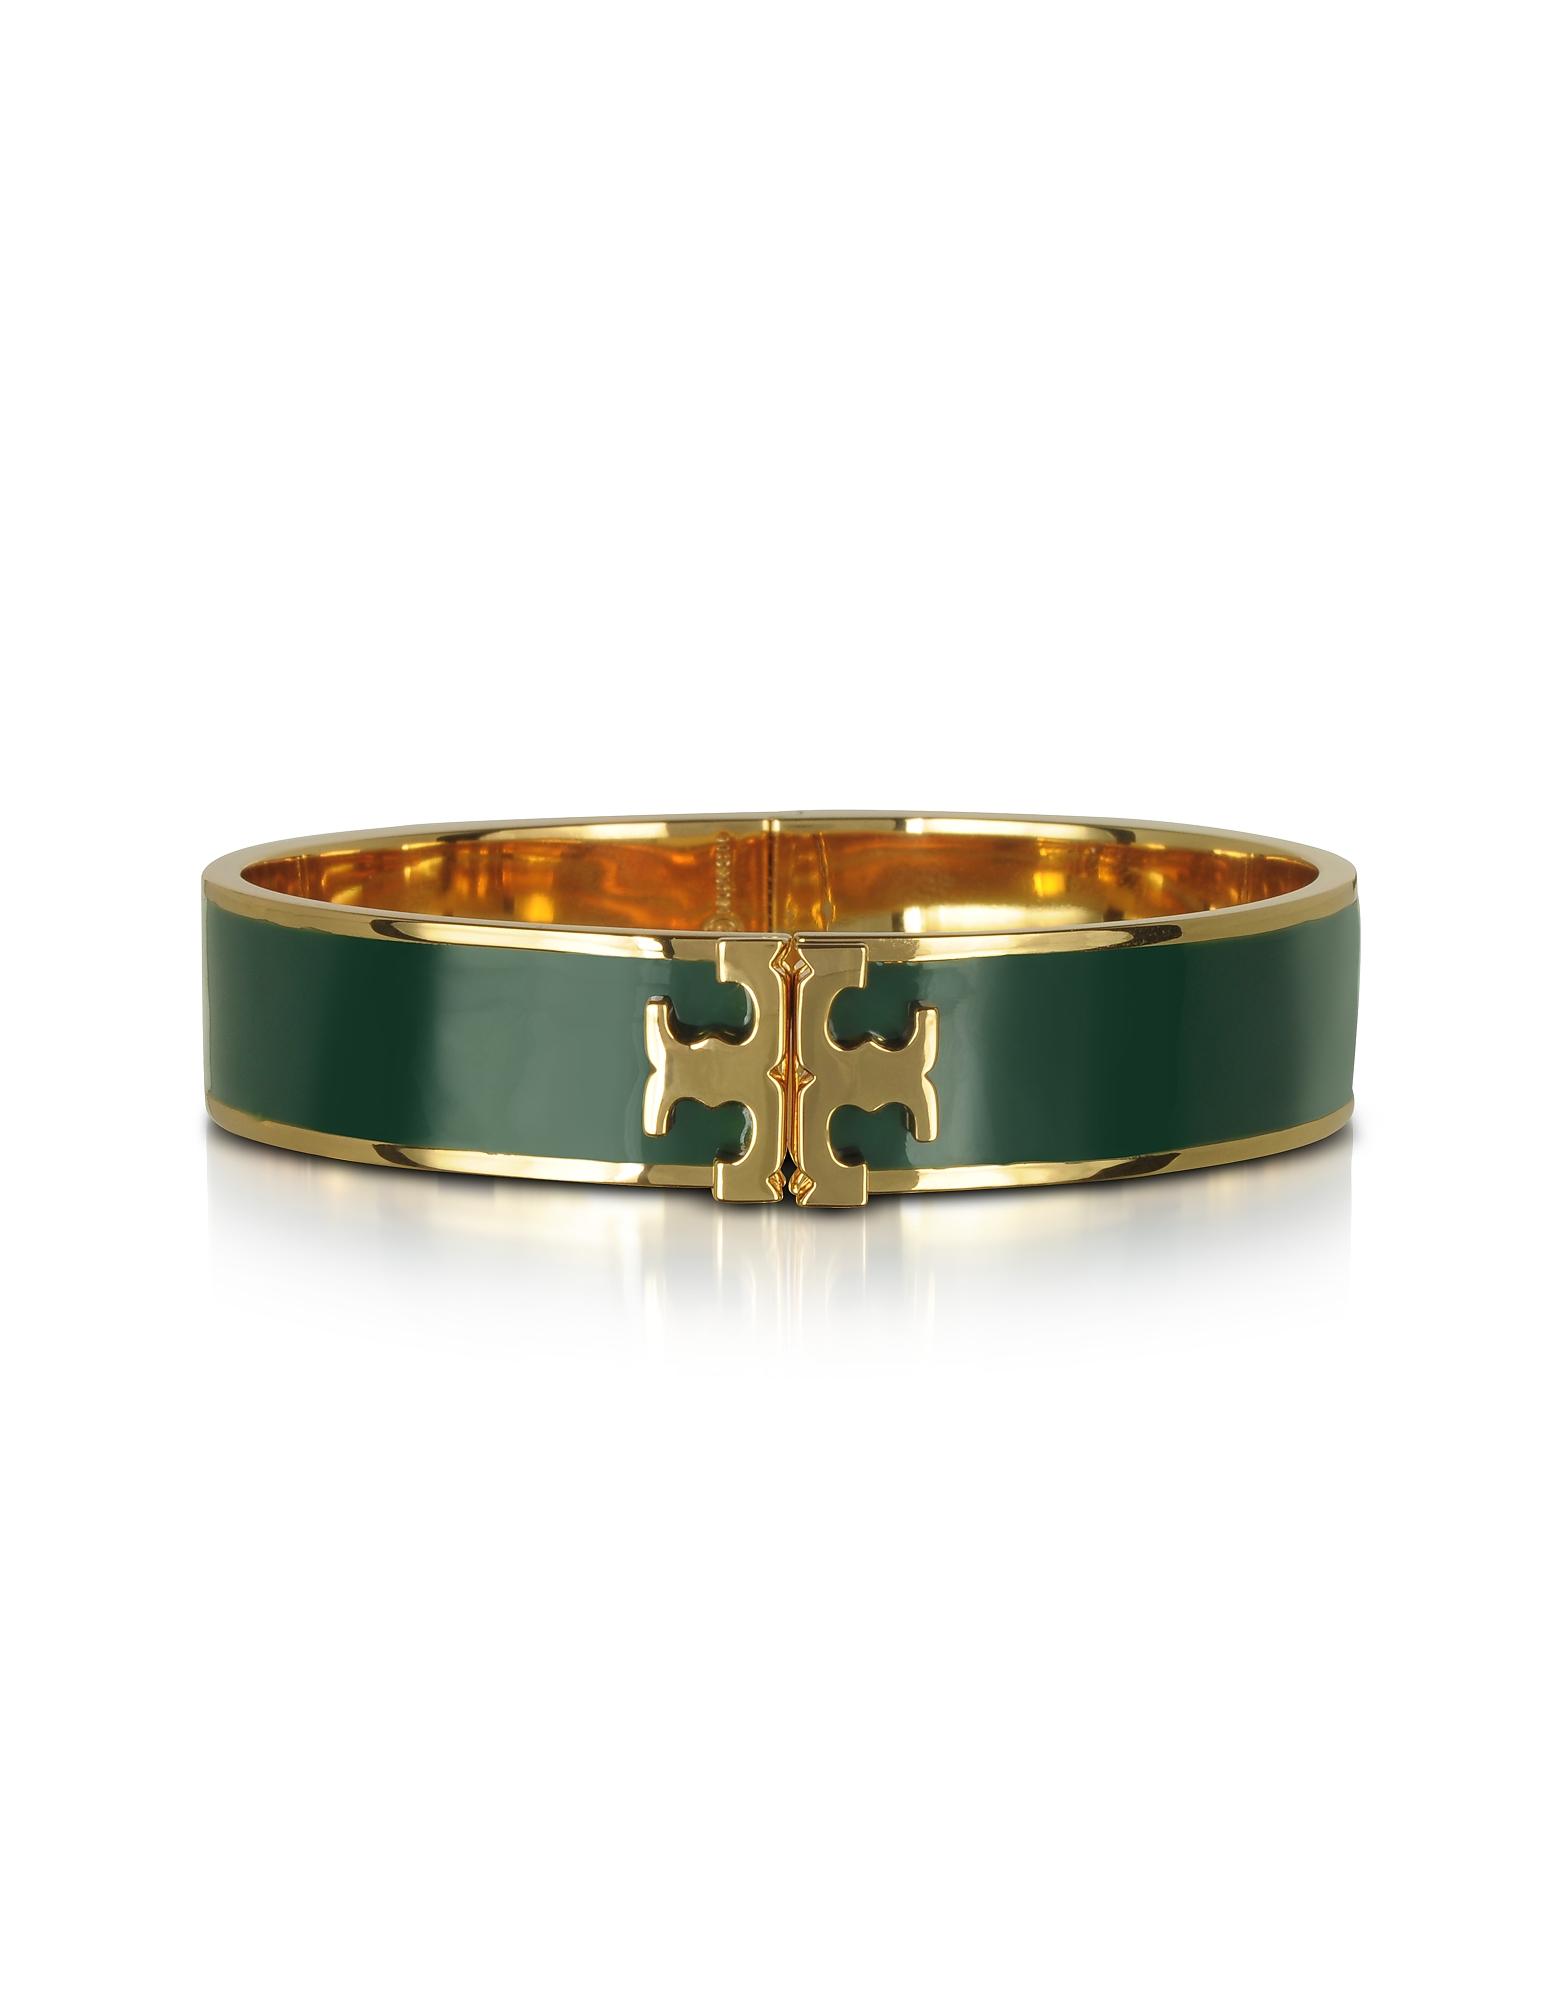 Tory Burch Bracelets, Raised Logo Banyan Green Enamel Thin Cuff Bracelet